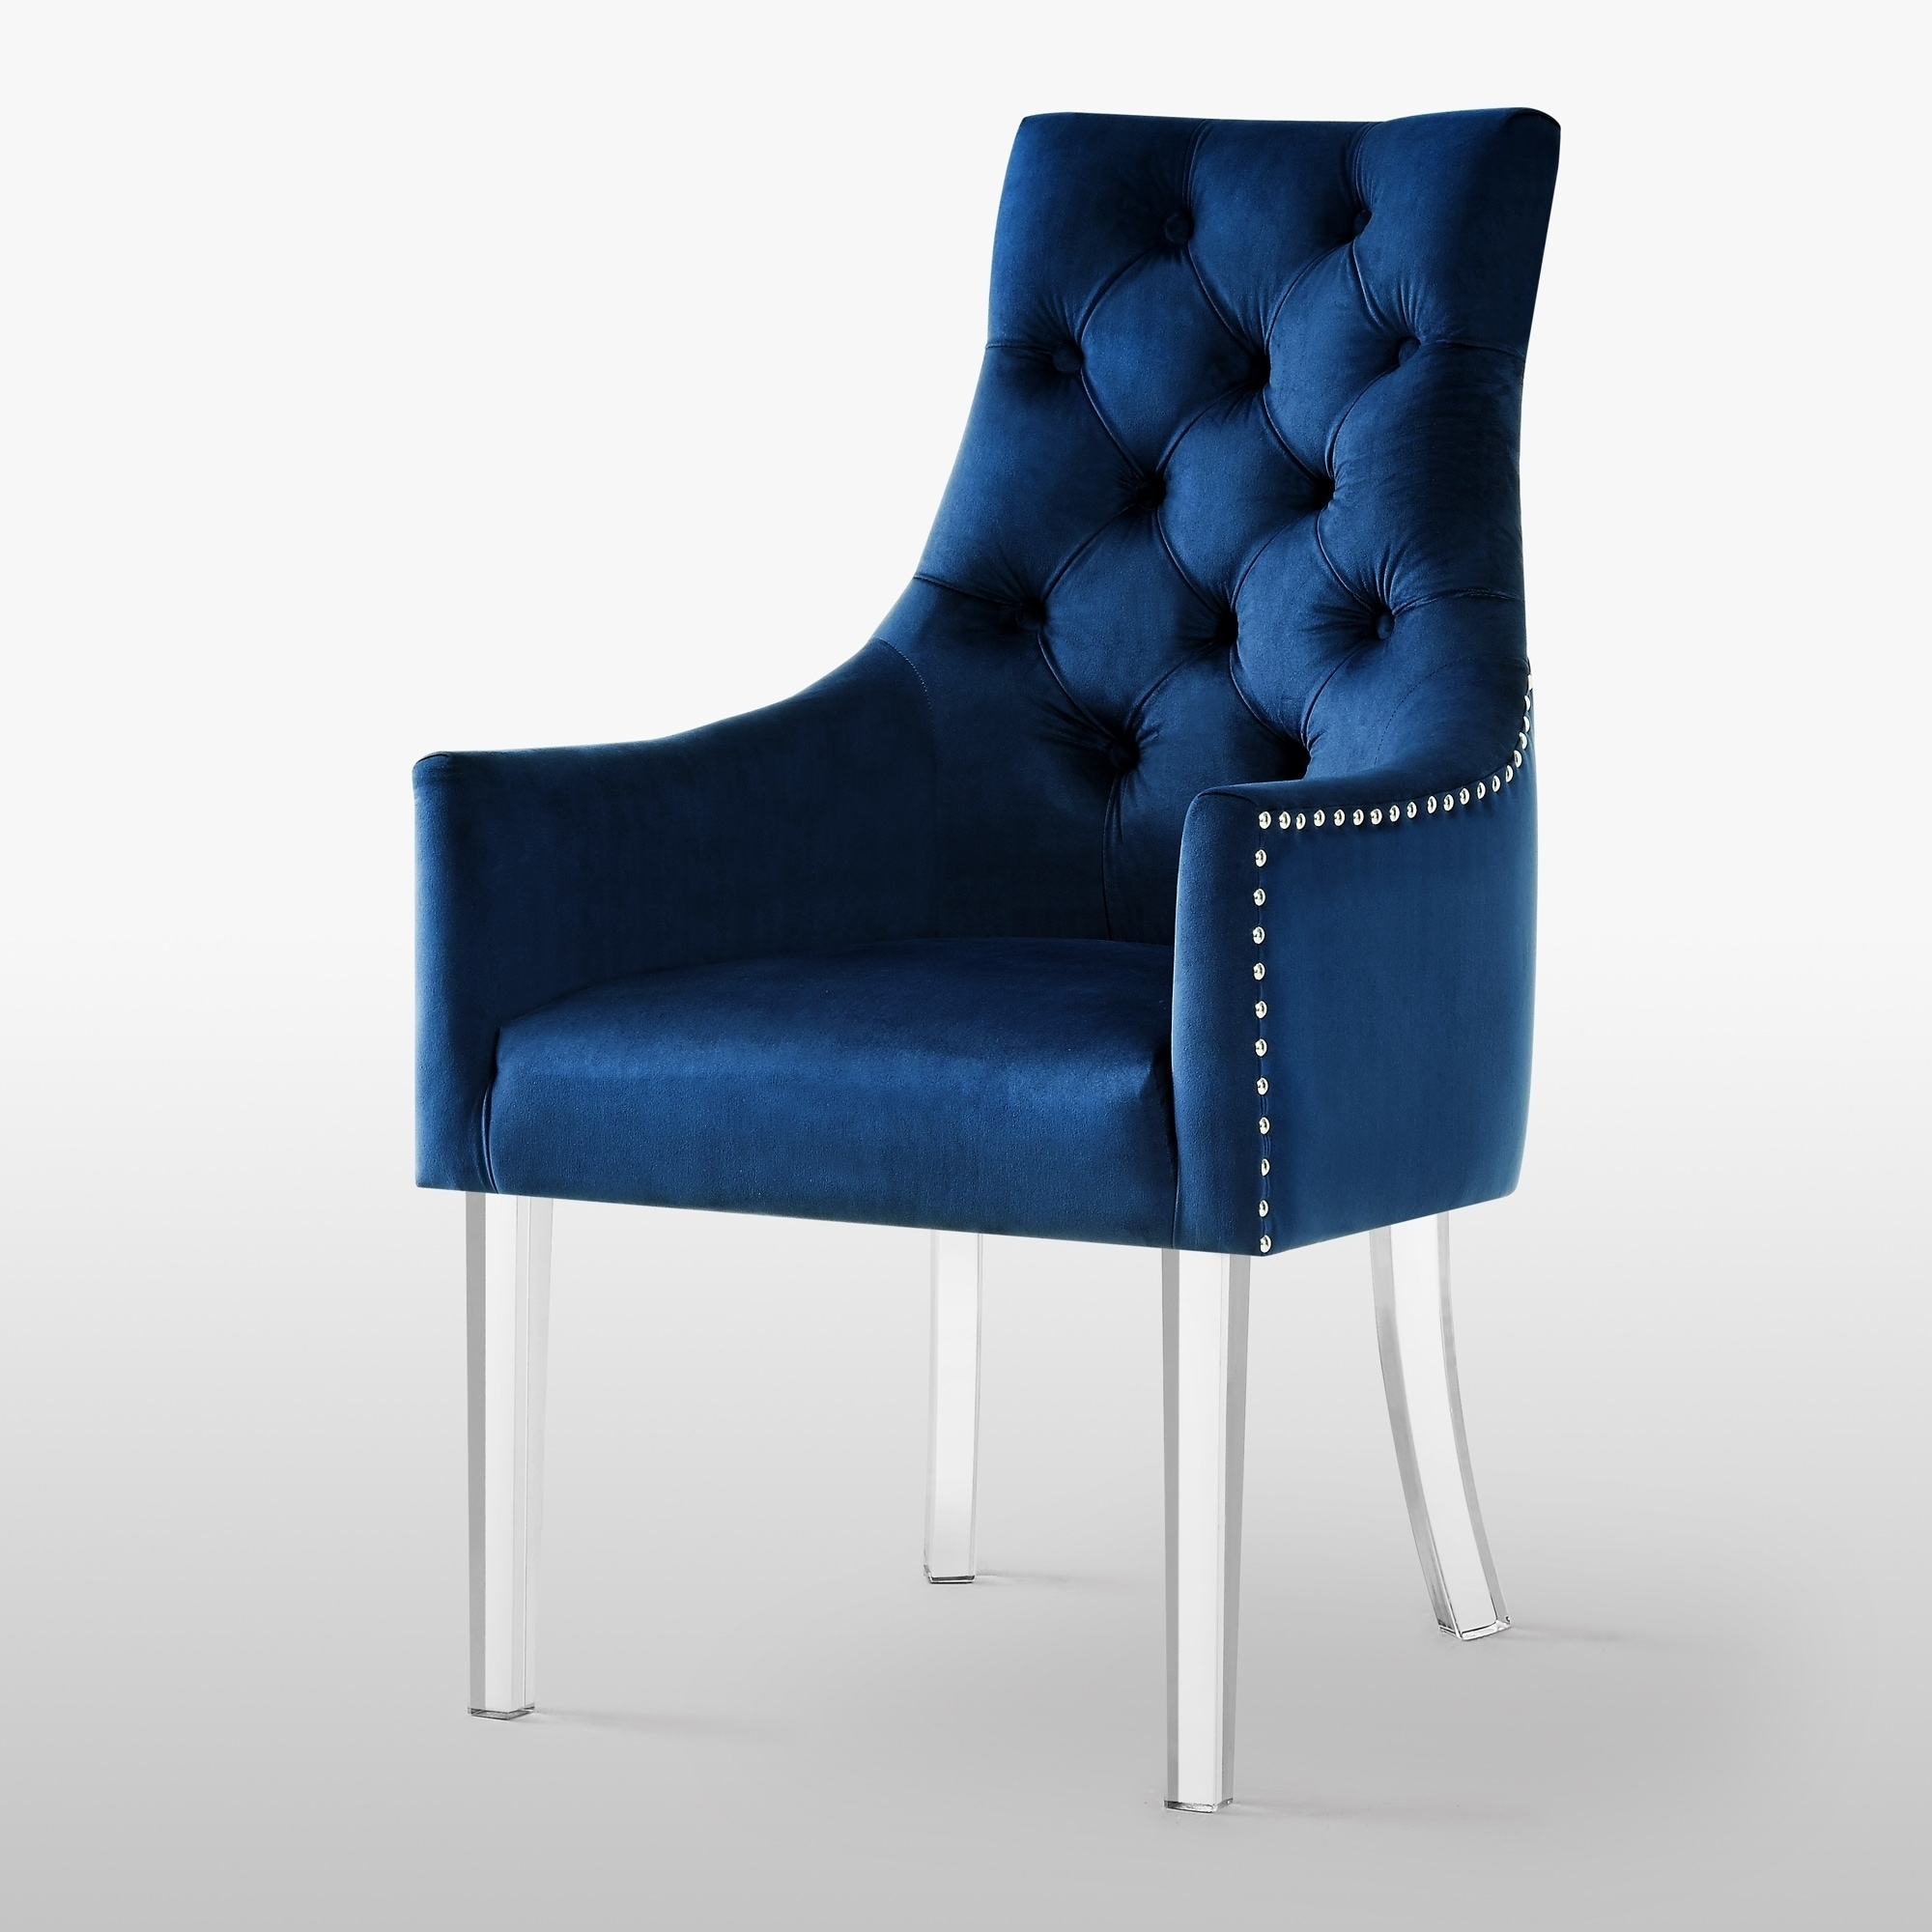 Blue Velvet Kitchen Dining Room Chairs Online At Our Best Bar Furniture Deals